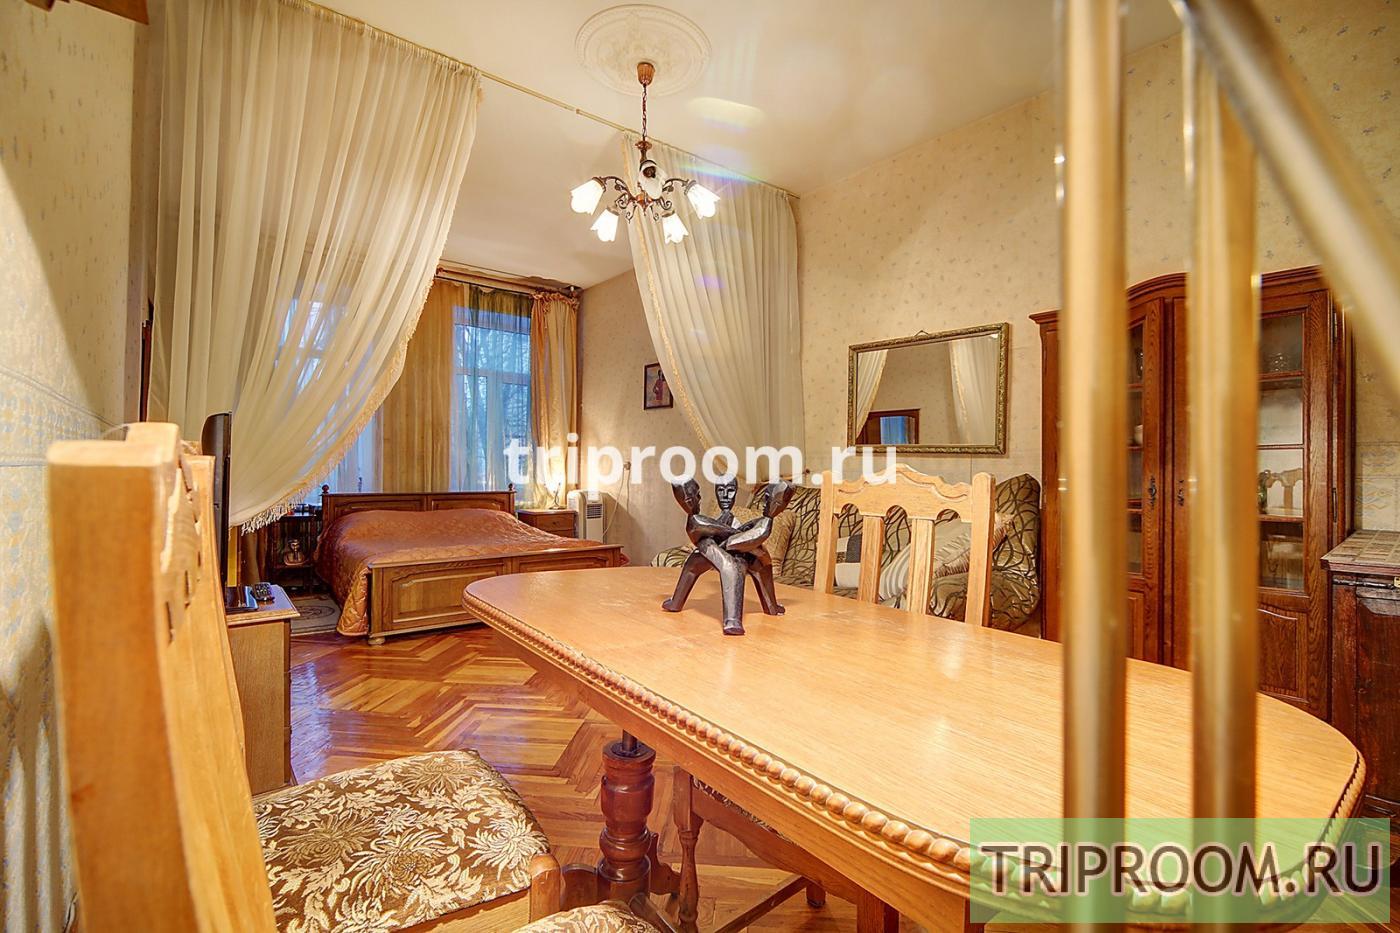 1-комнатная квартира посуточно (вариант № 15445), ул. Лиговский проспект, фото № 9